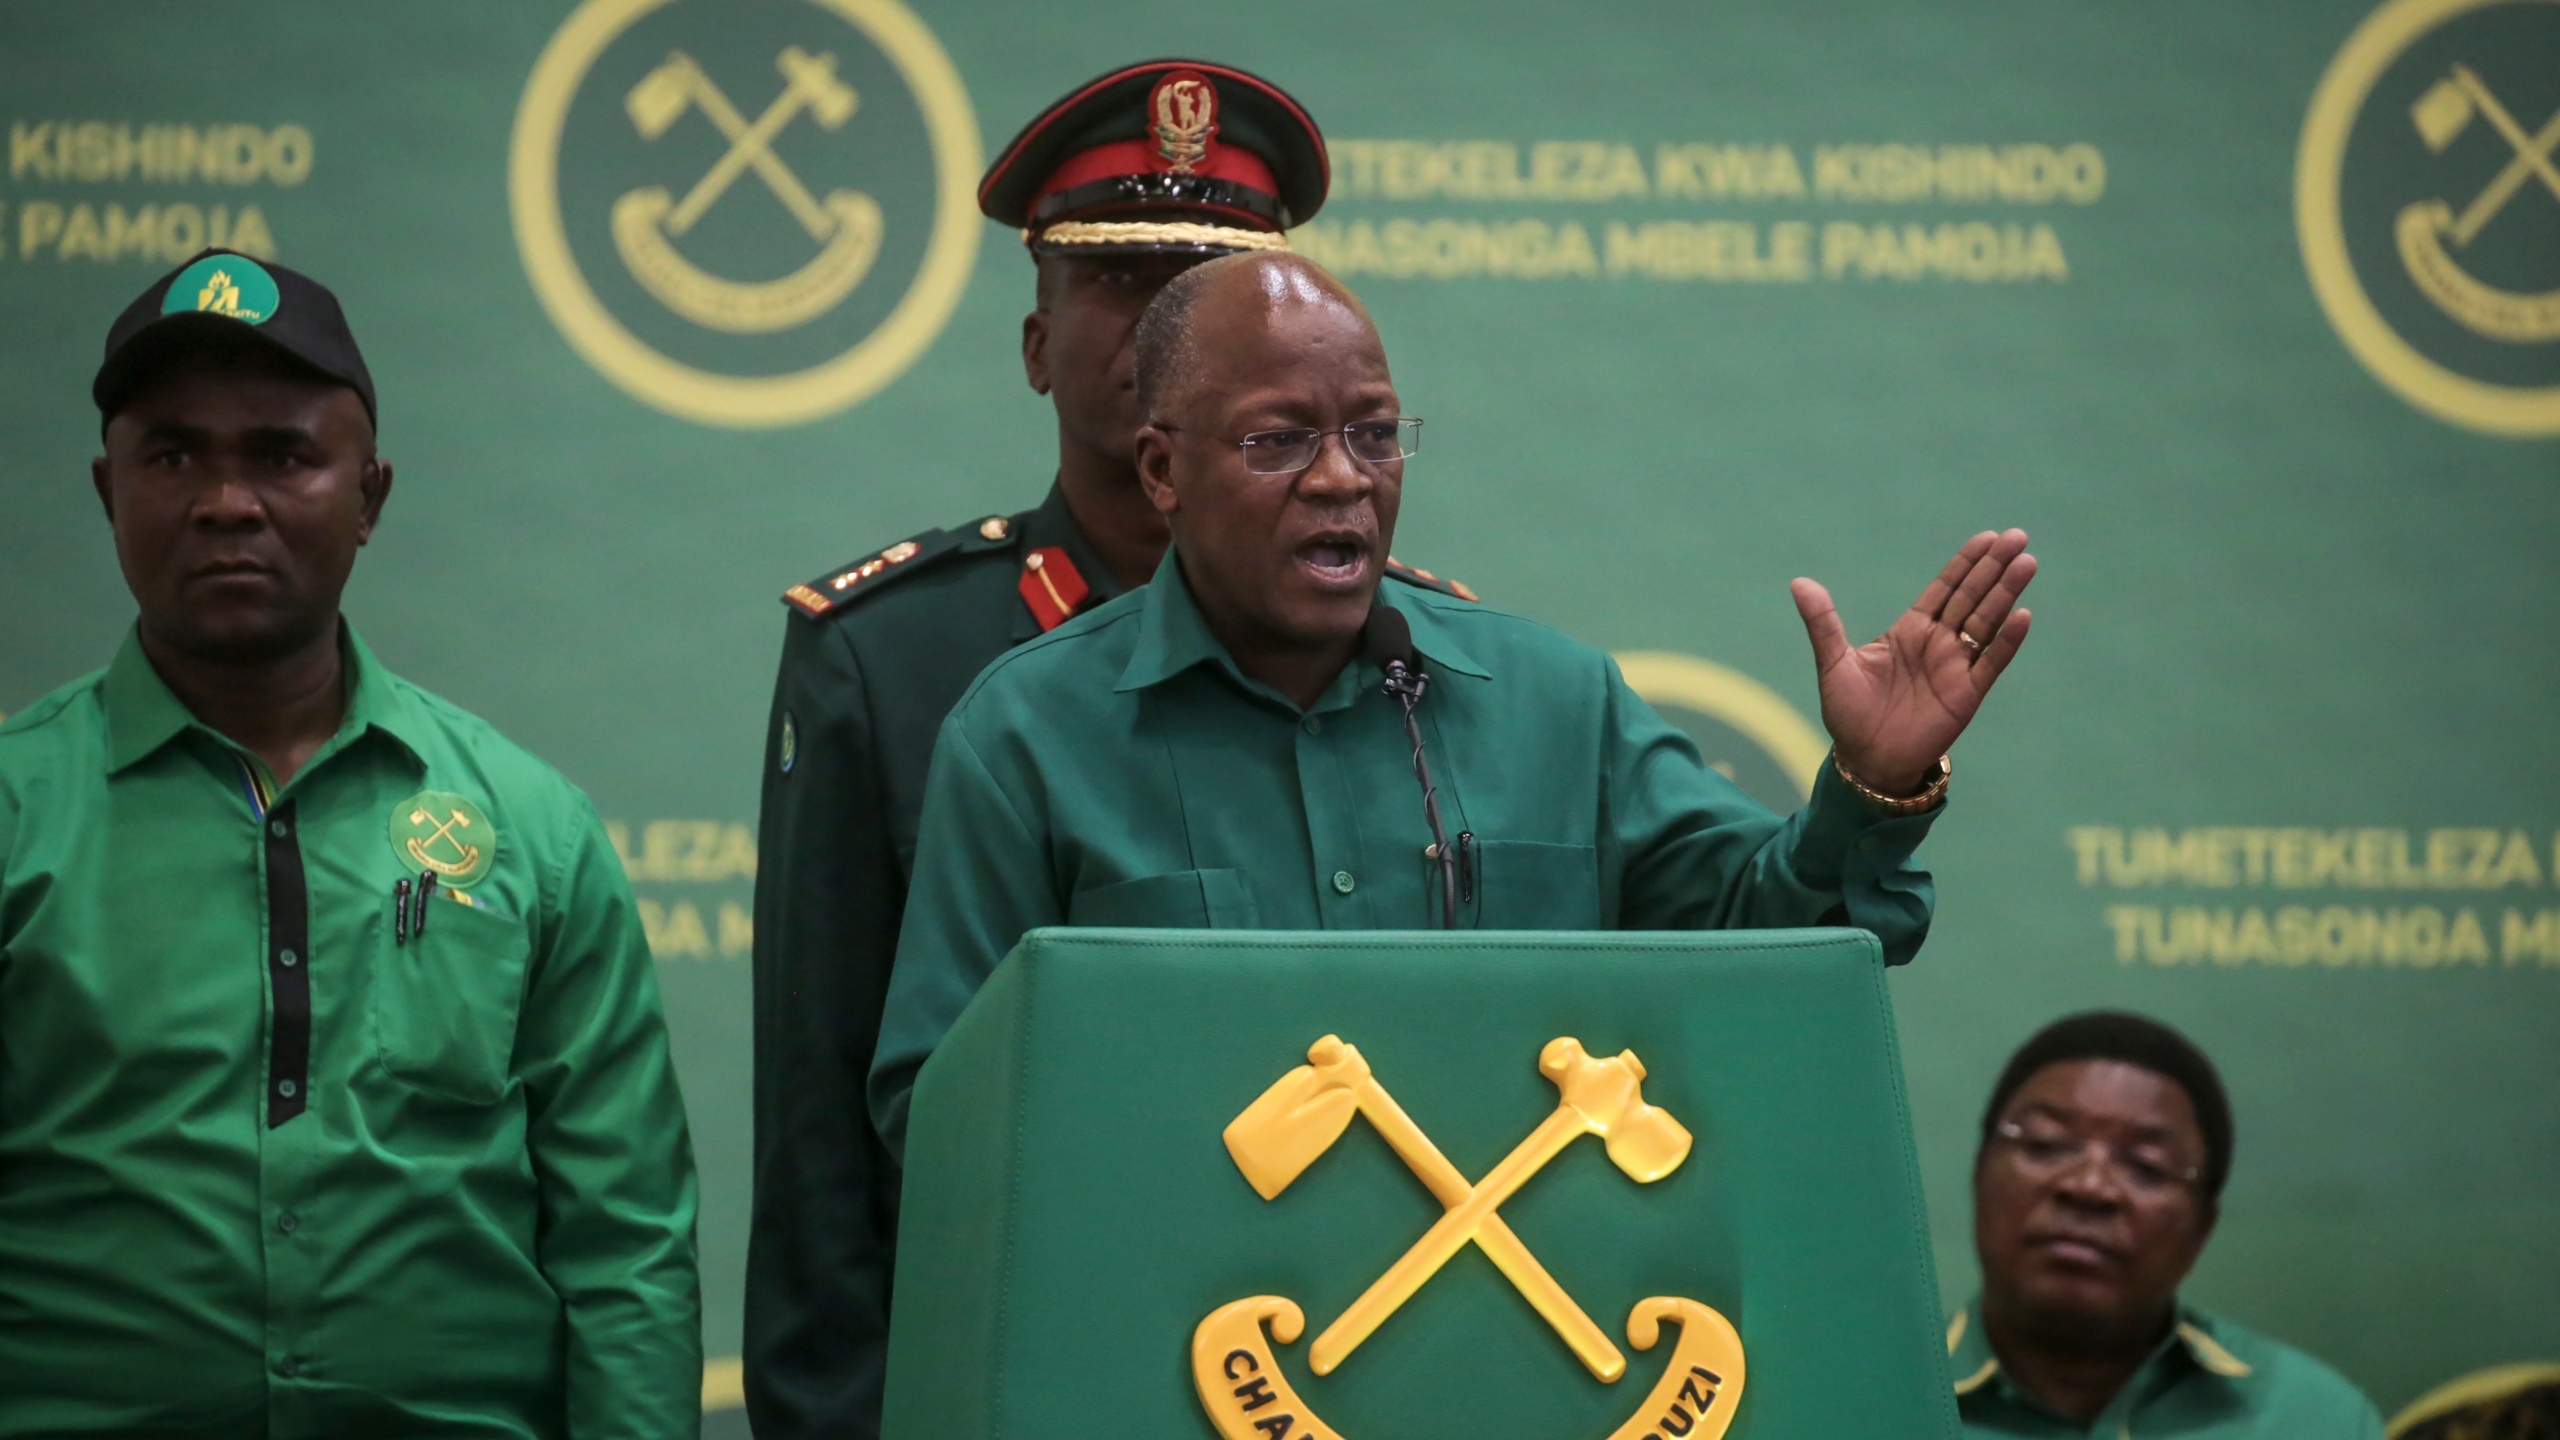 John Magufuli der Präsident von Tansania ist Tod.